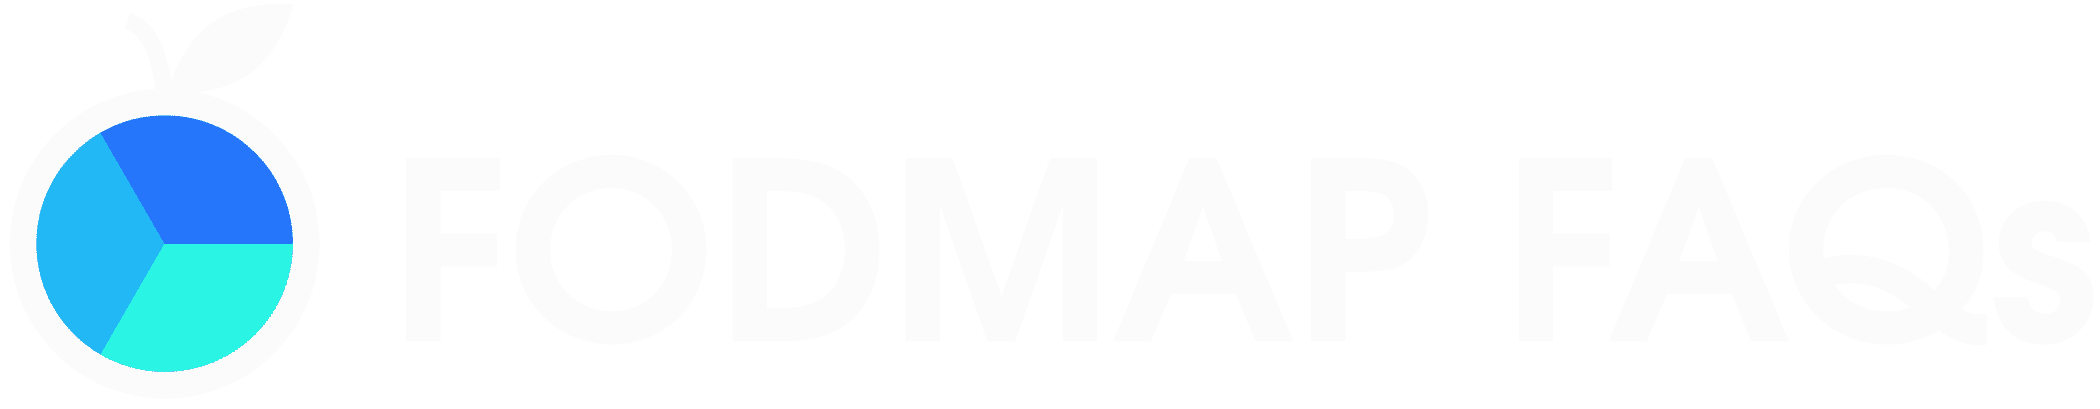 FODMAP FAQs